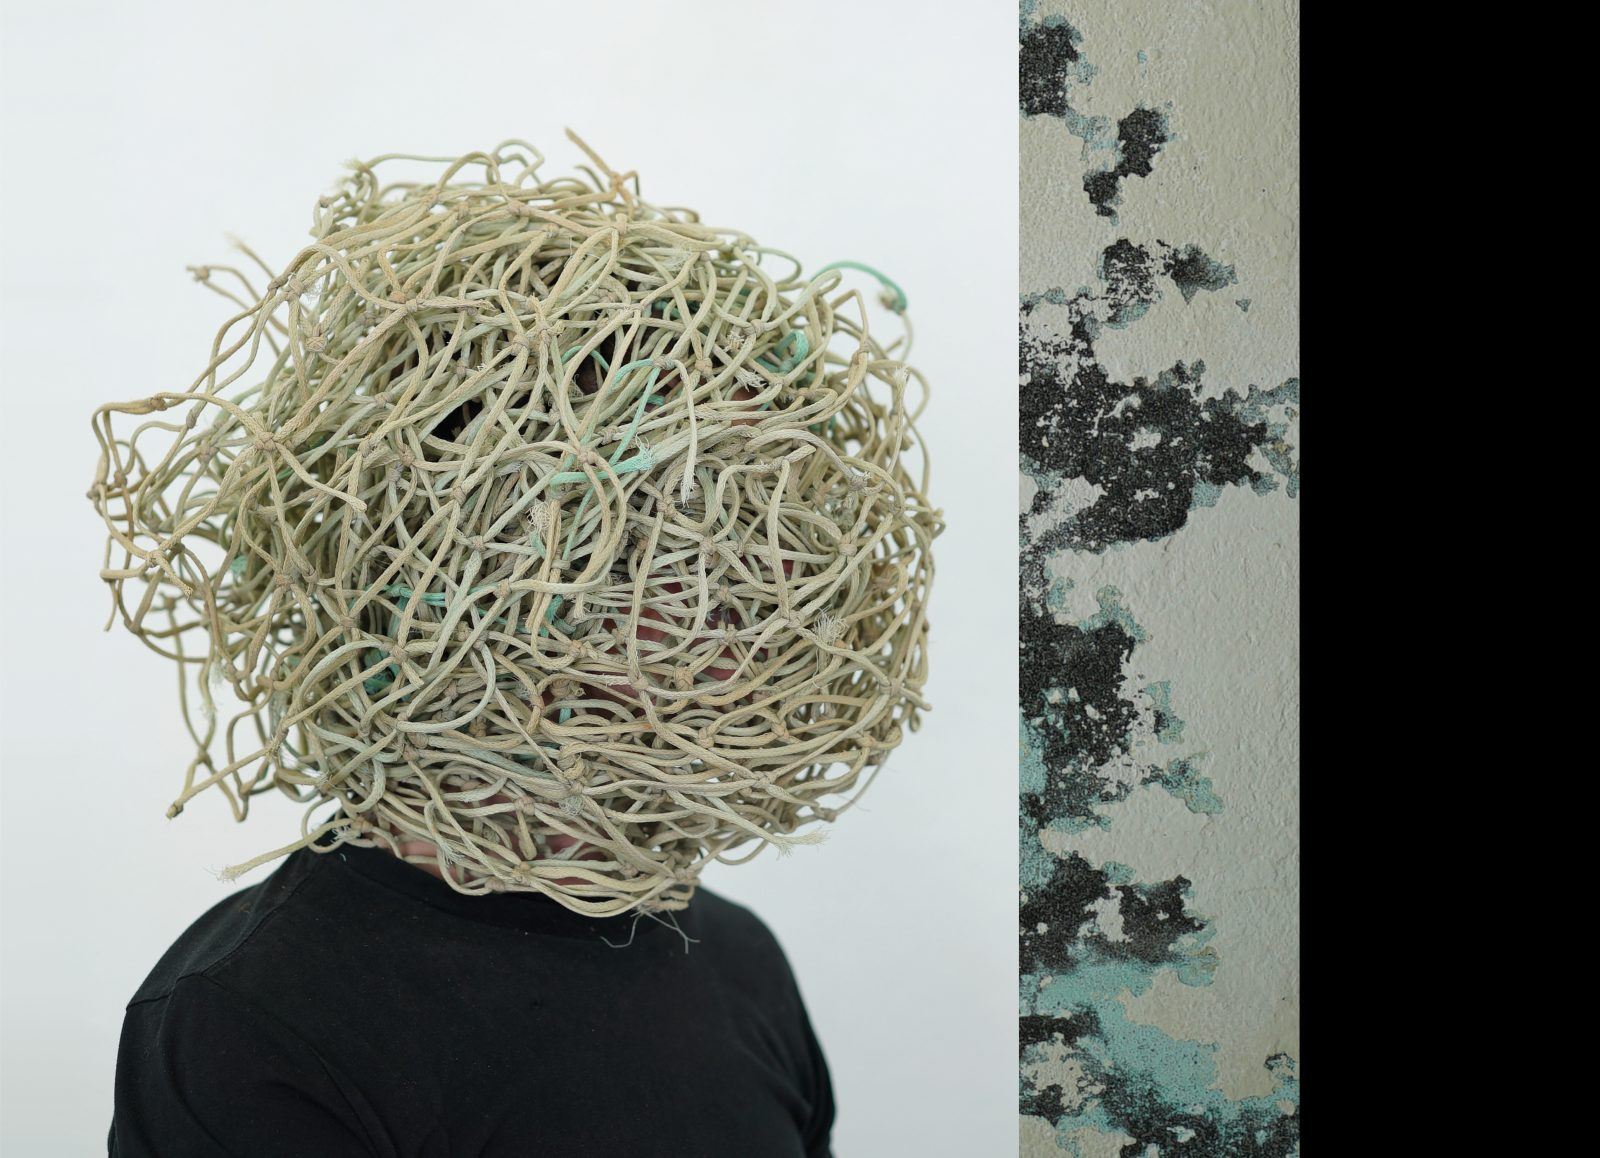 NÖ Waldviertel Galerie Kunst - Das war: Lisa Weber & Markus Walenzyk